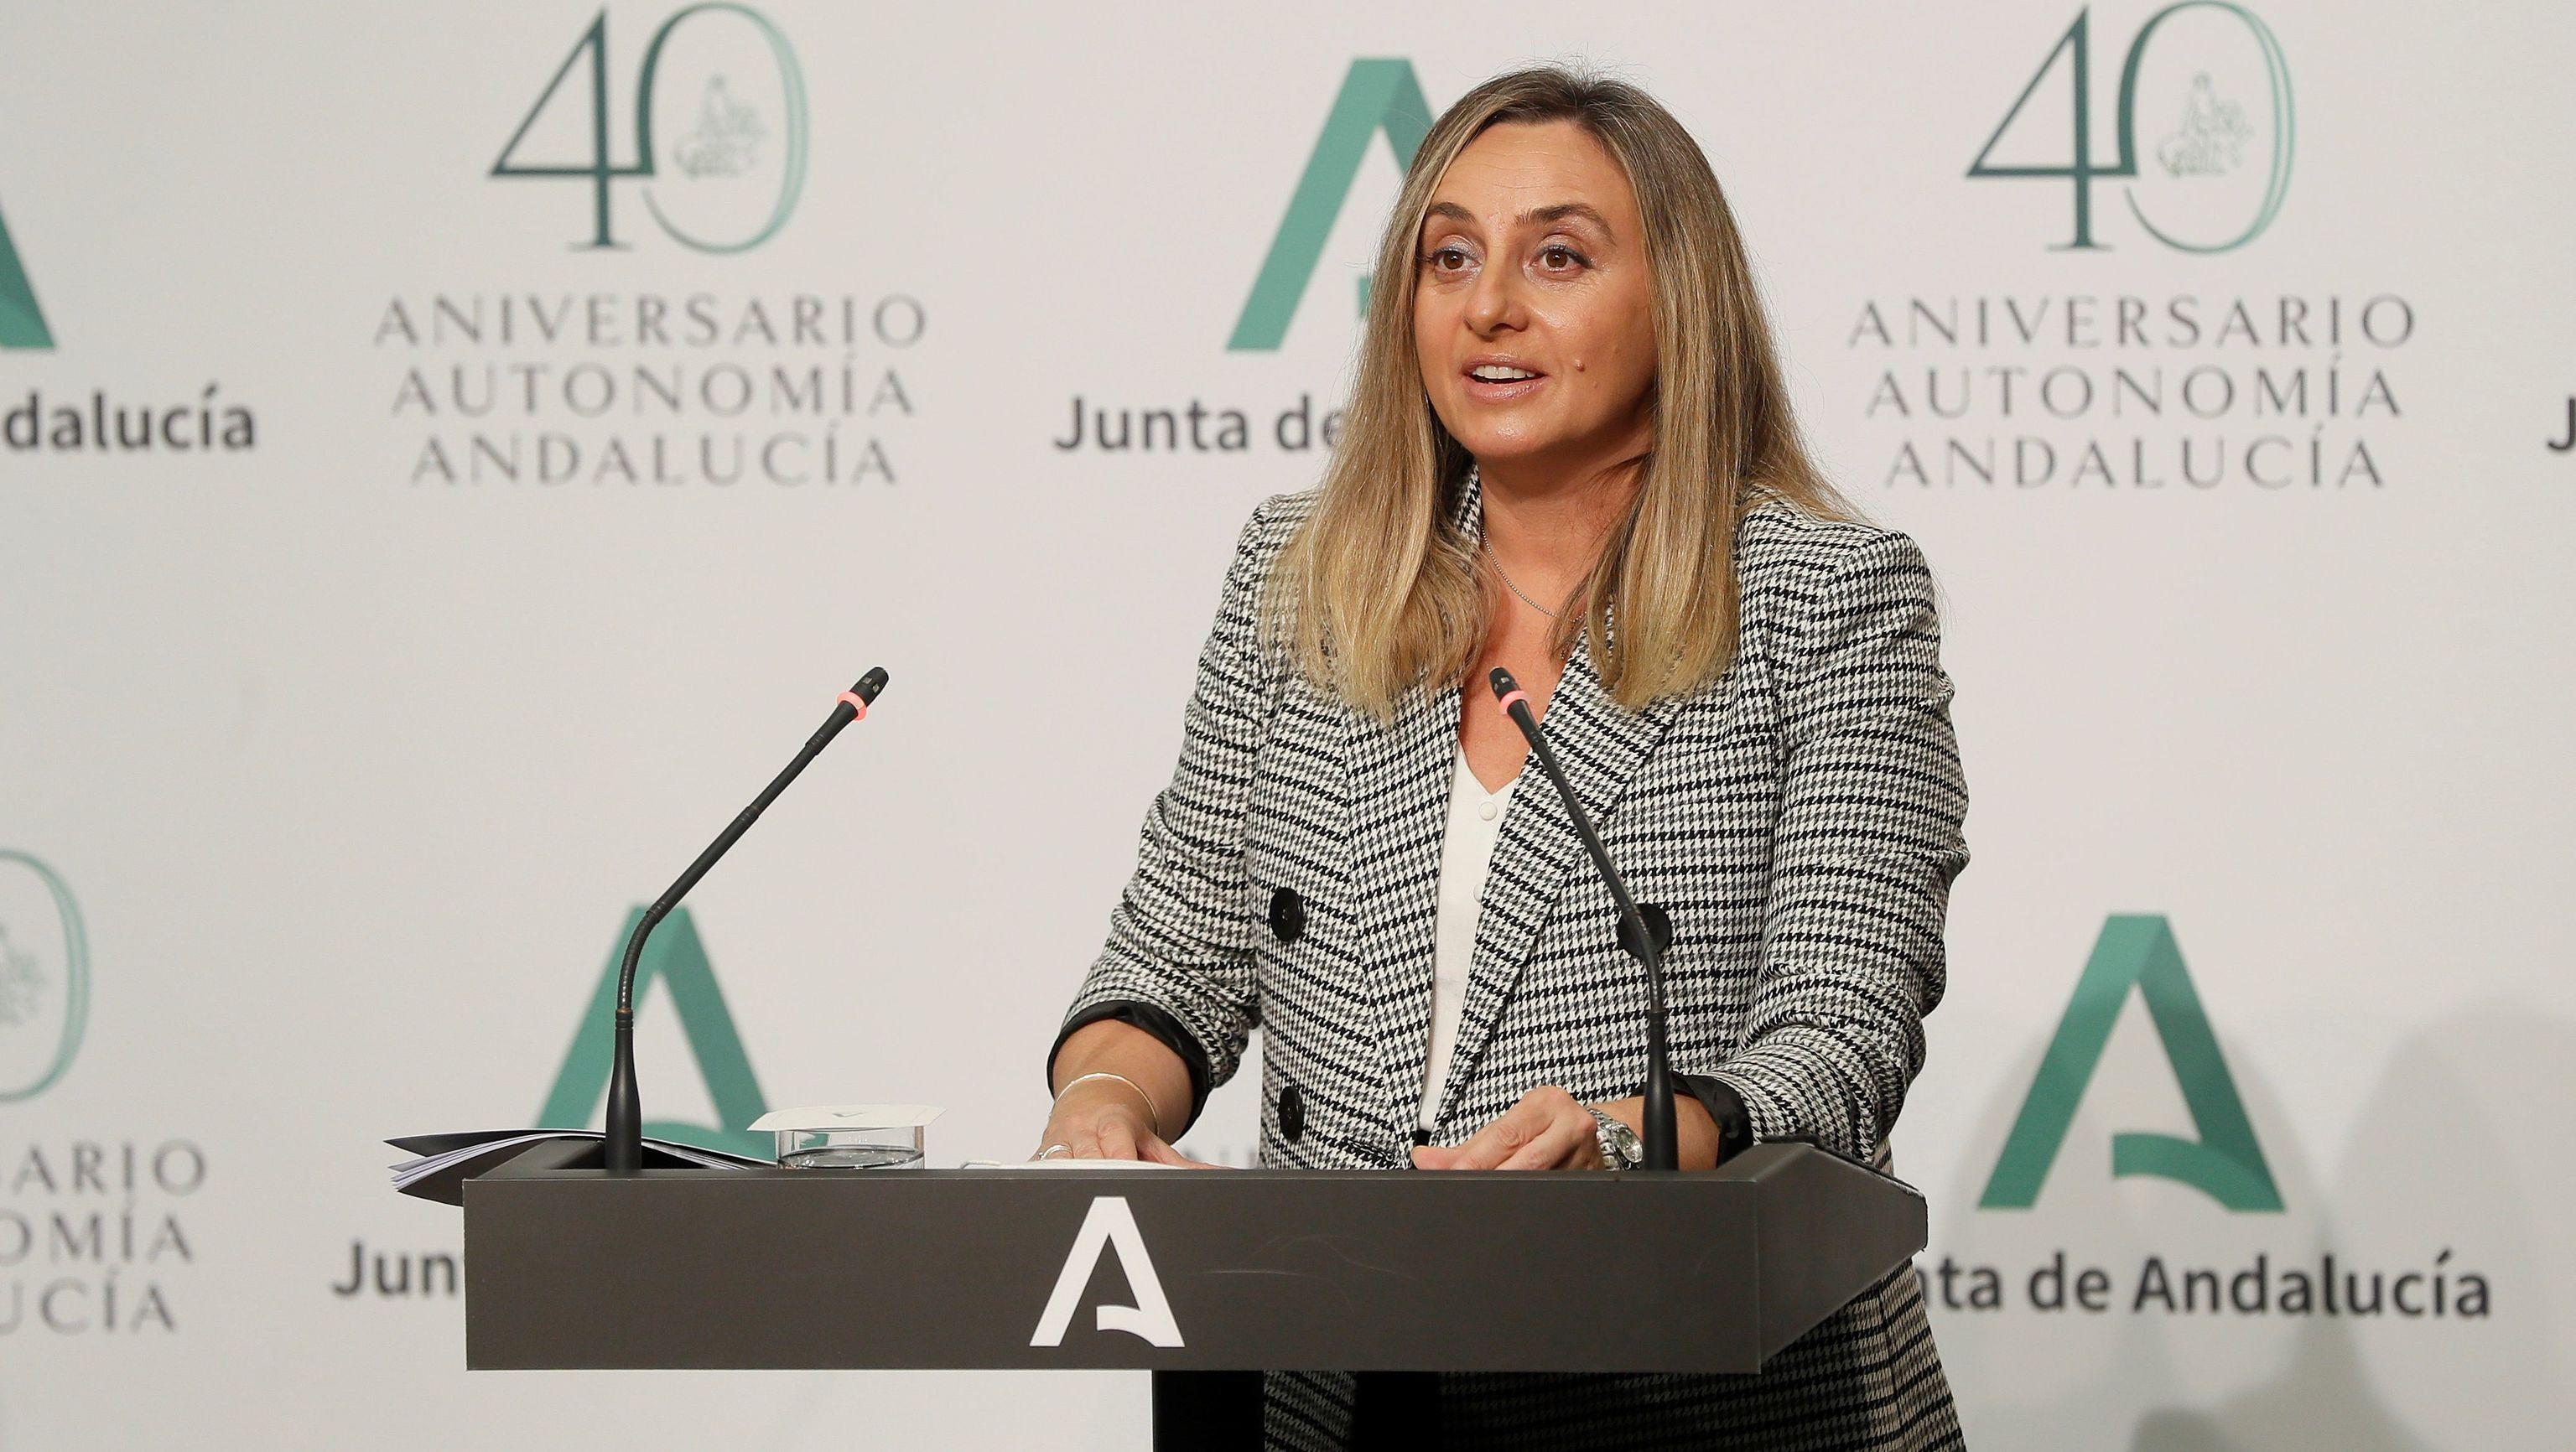 La consejera andaluza de Fomento, Marifrán Carazo.